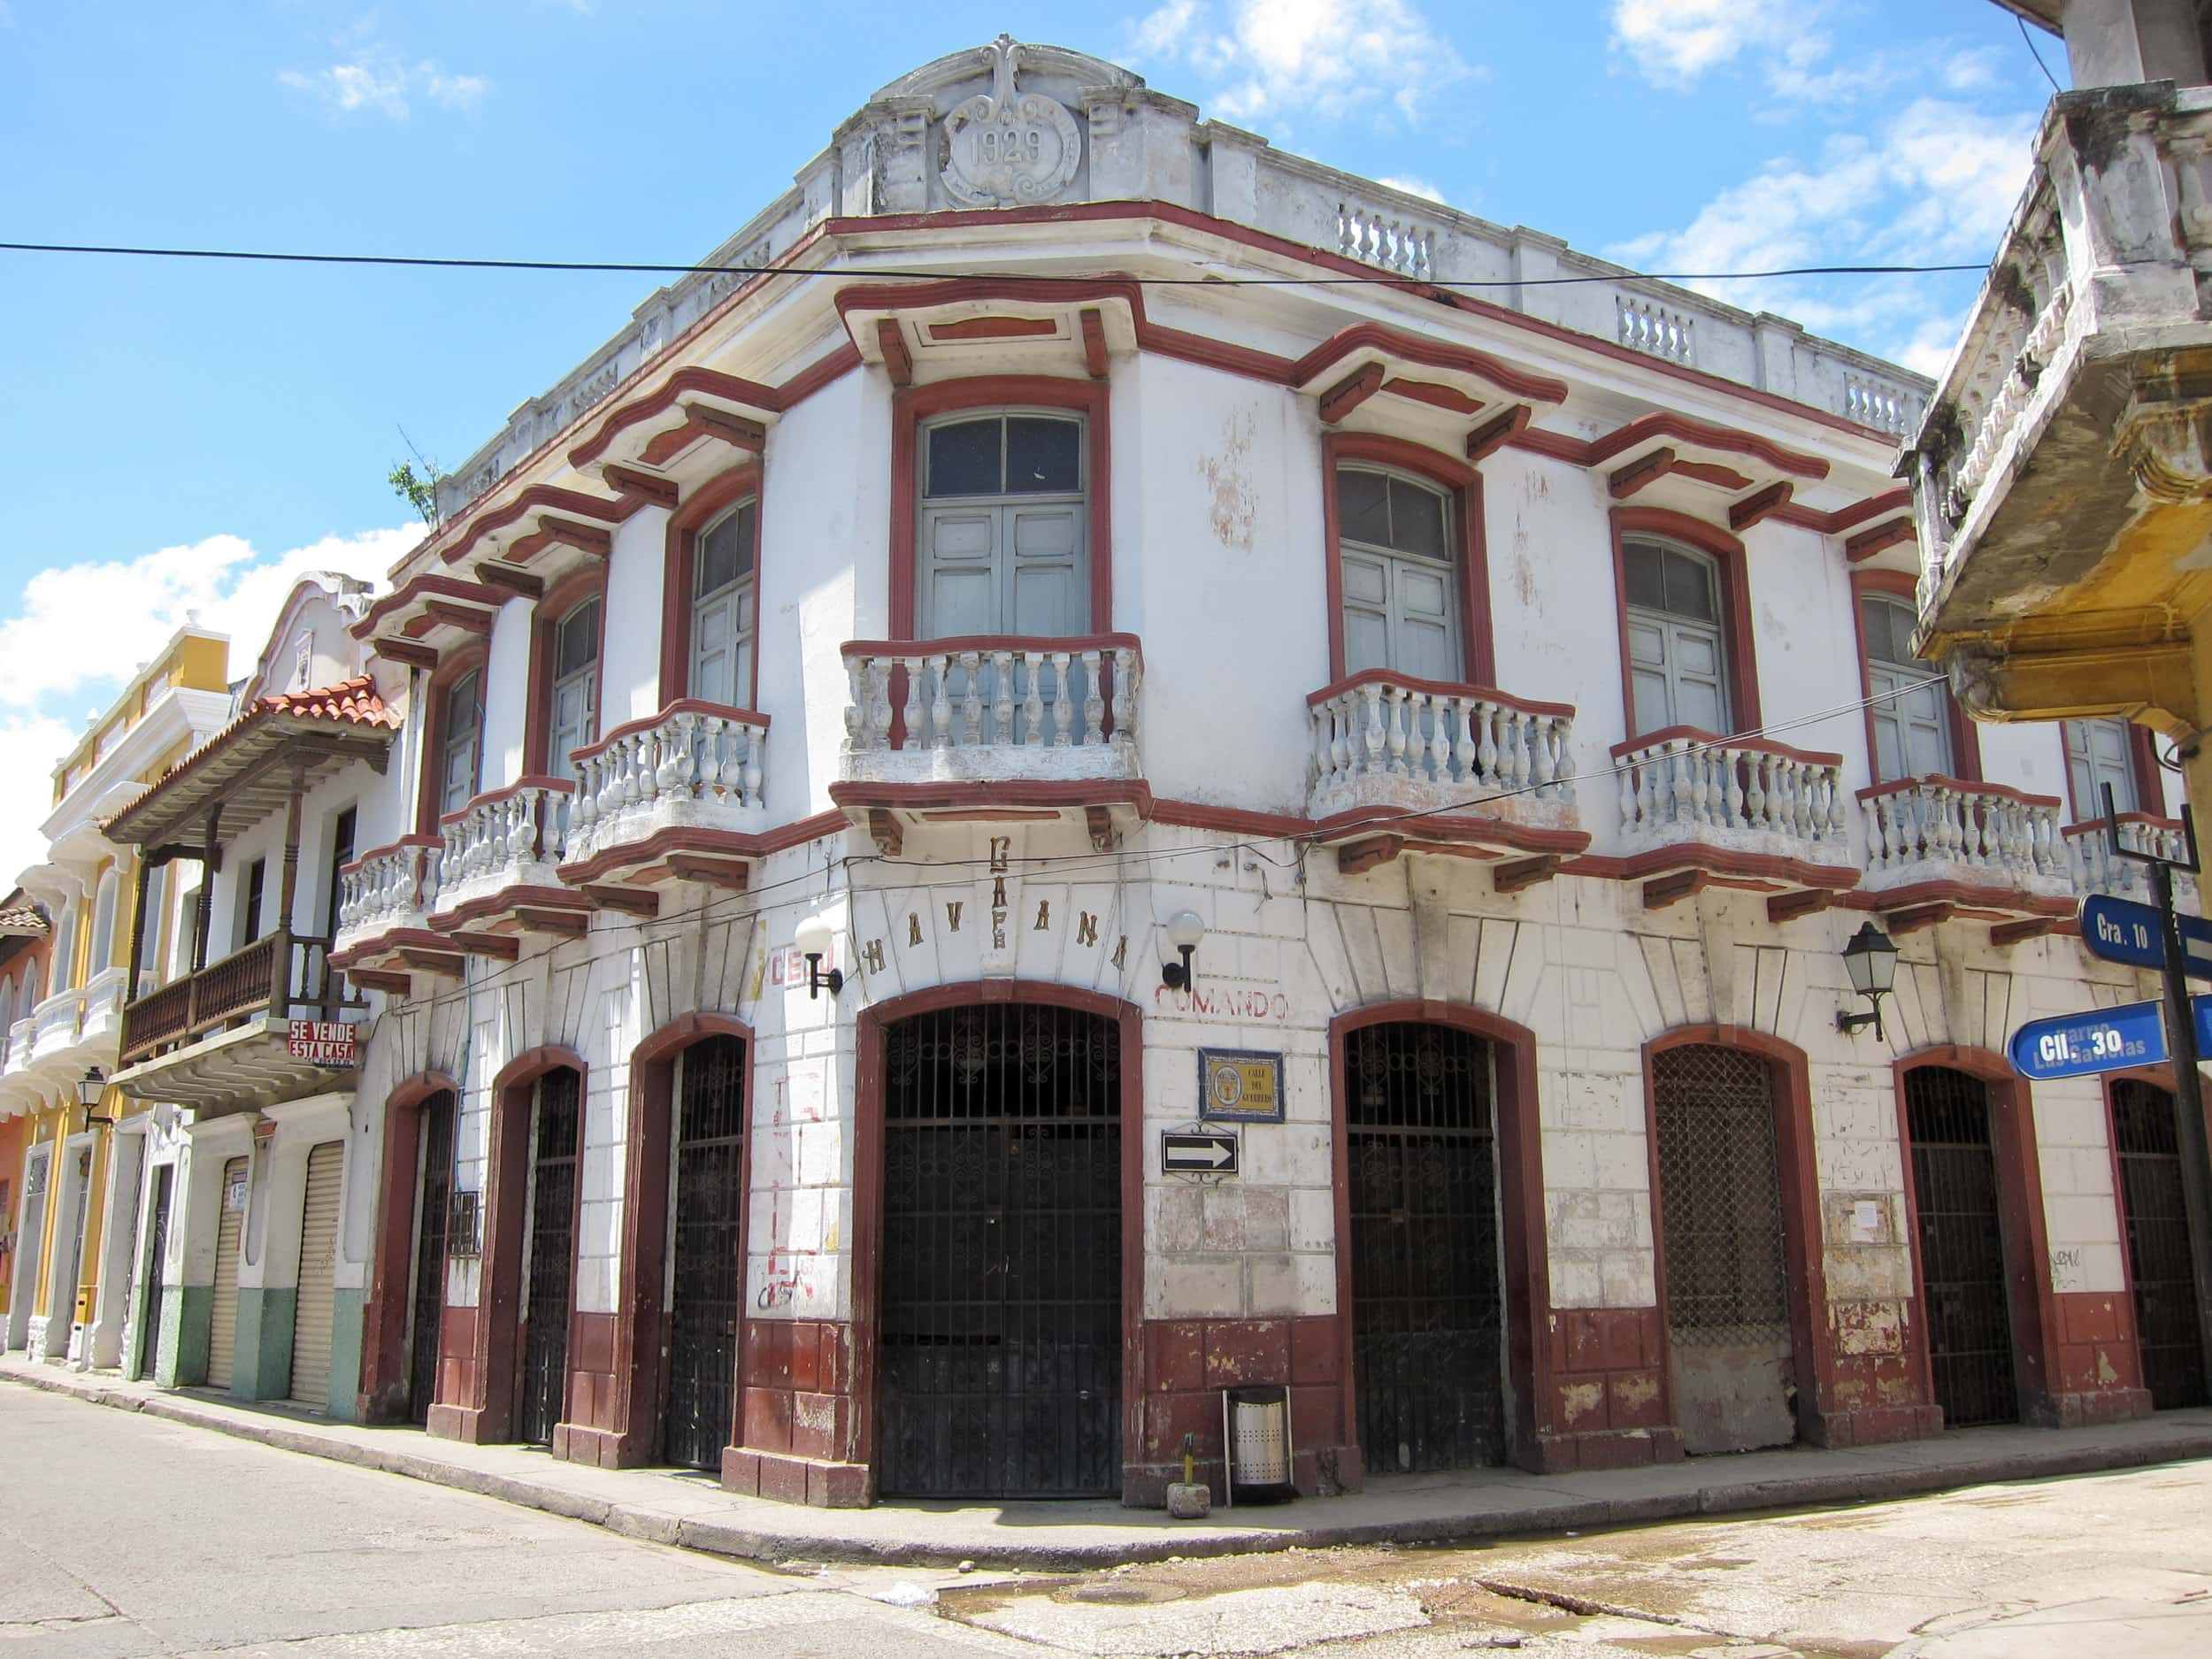 Cafe Havana in barrio Getsemani is a popular nightspot for salsa dancing